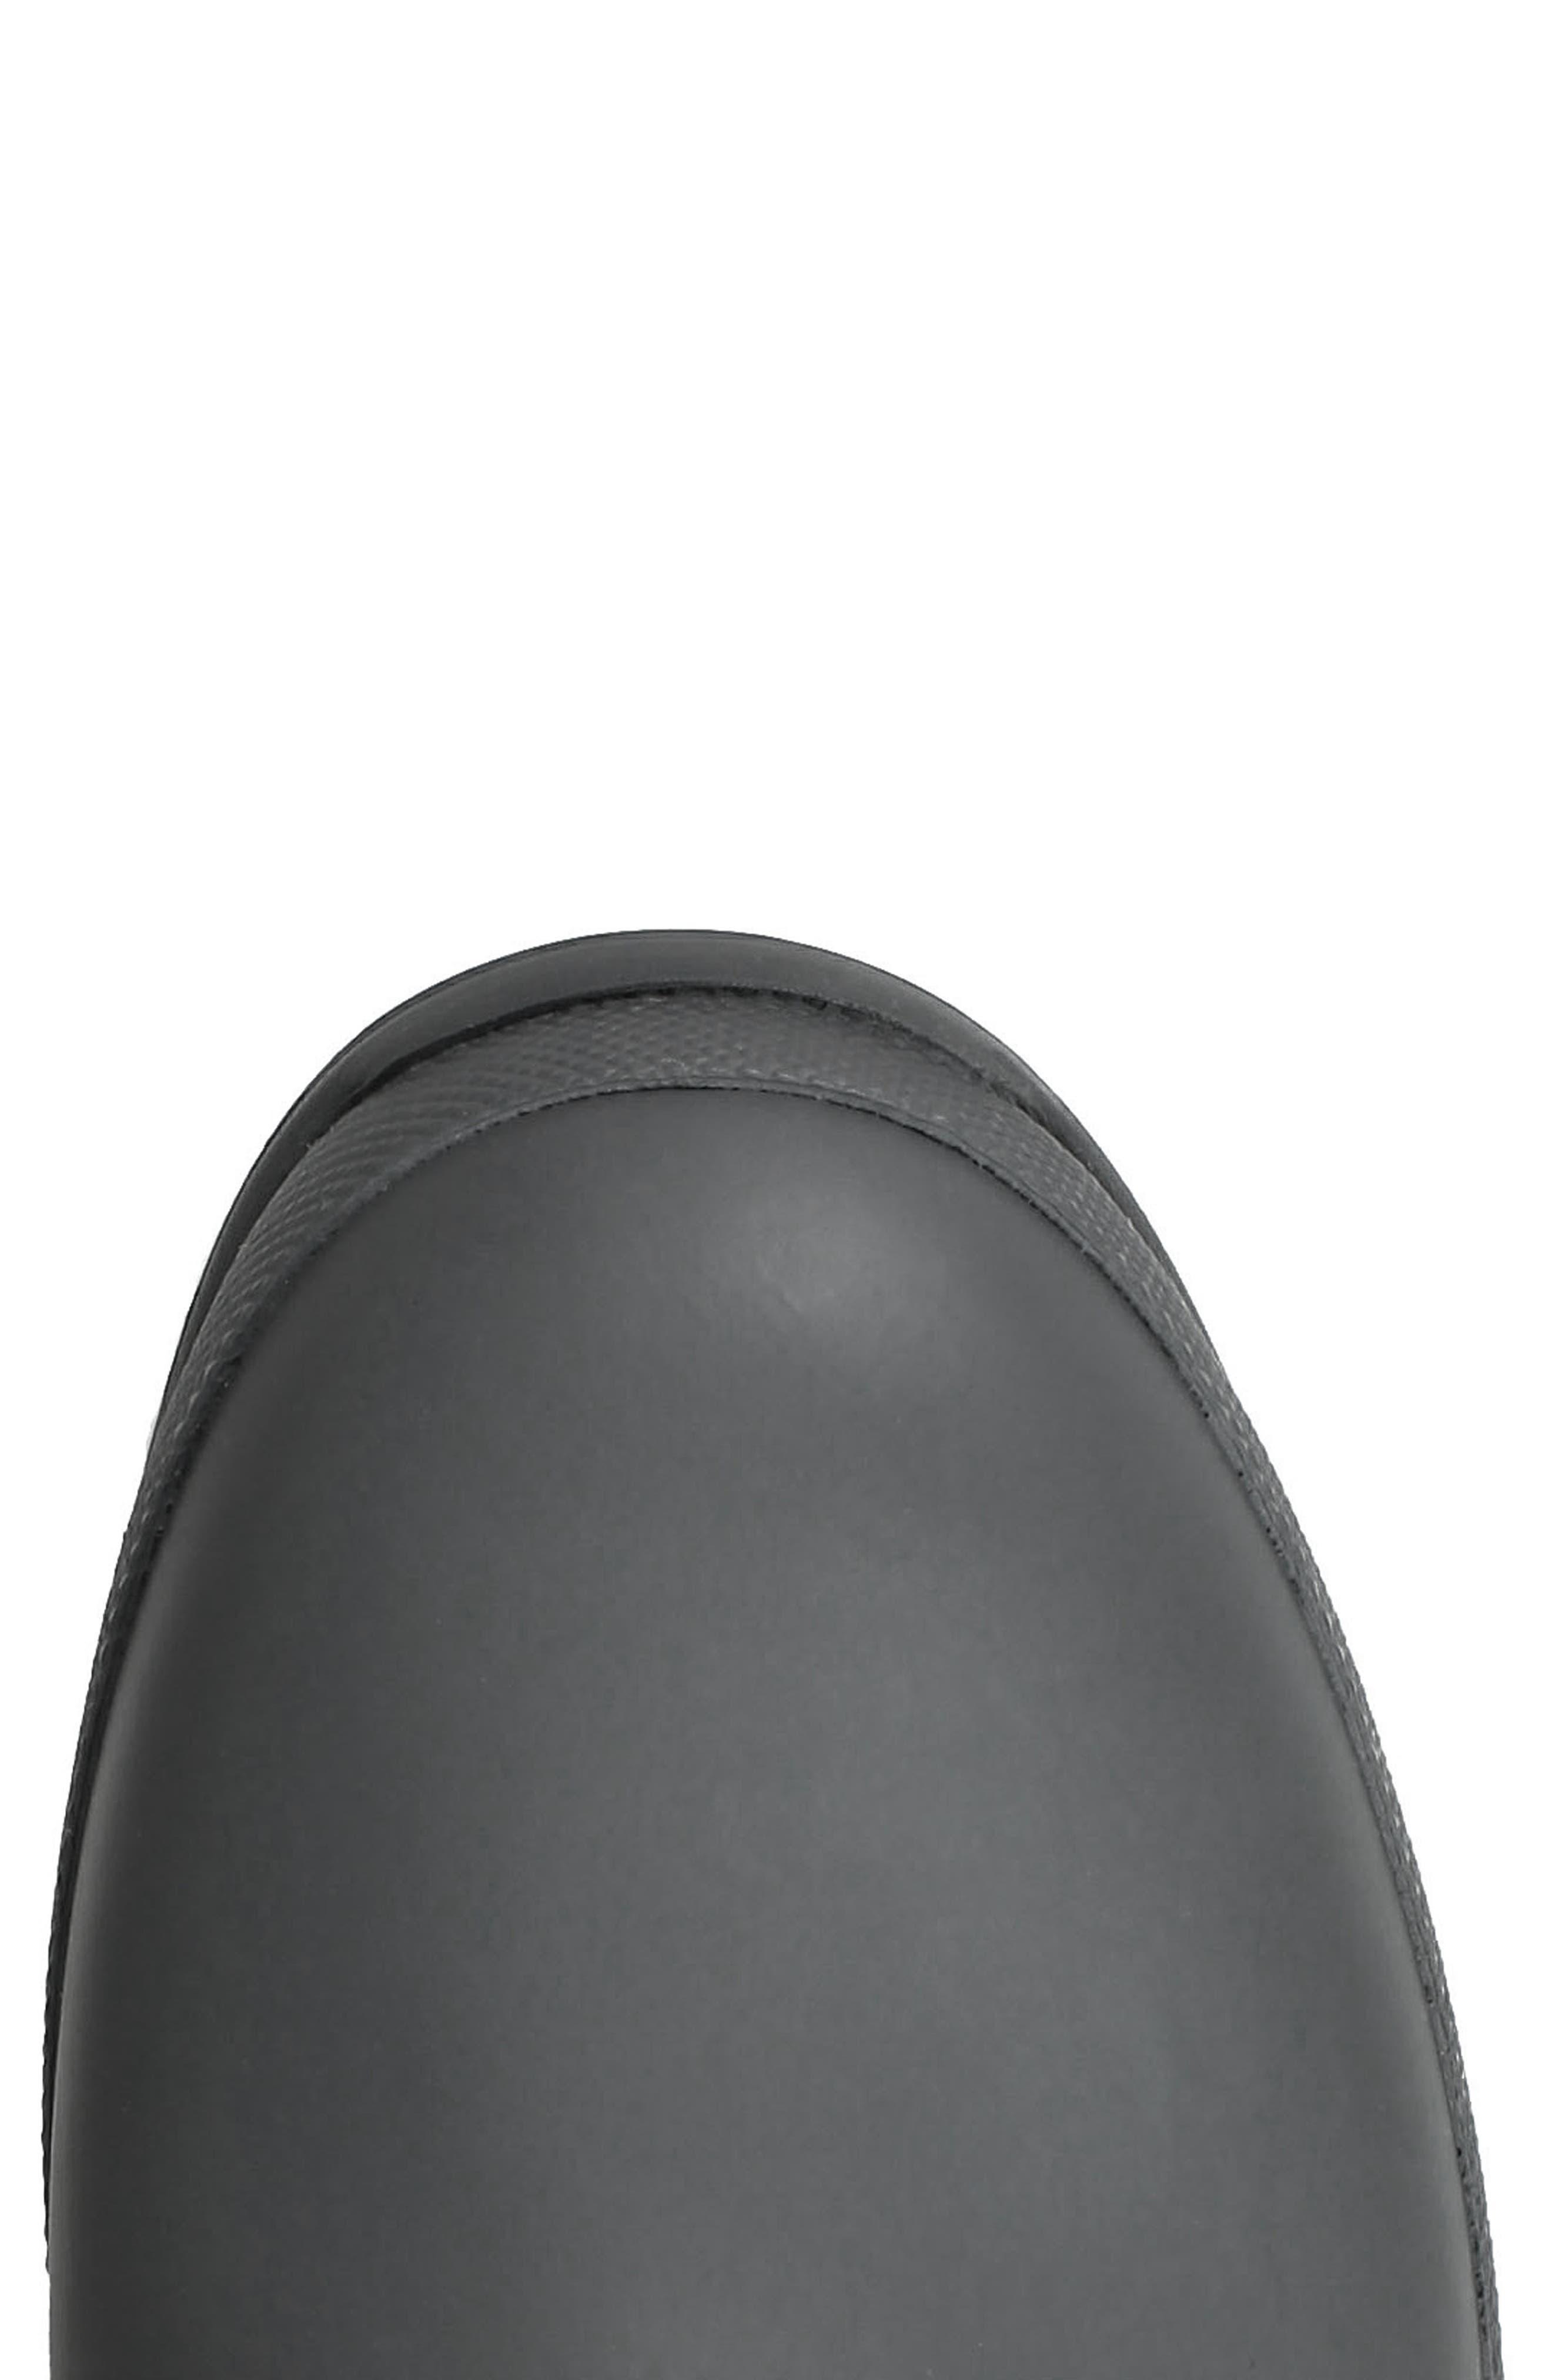 Crandall Waterproof Tall Boot,                             Alternate thumbnail 7, color,                             DARK GREY